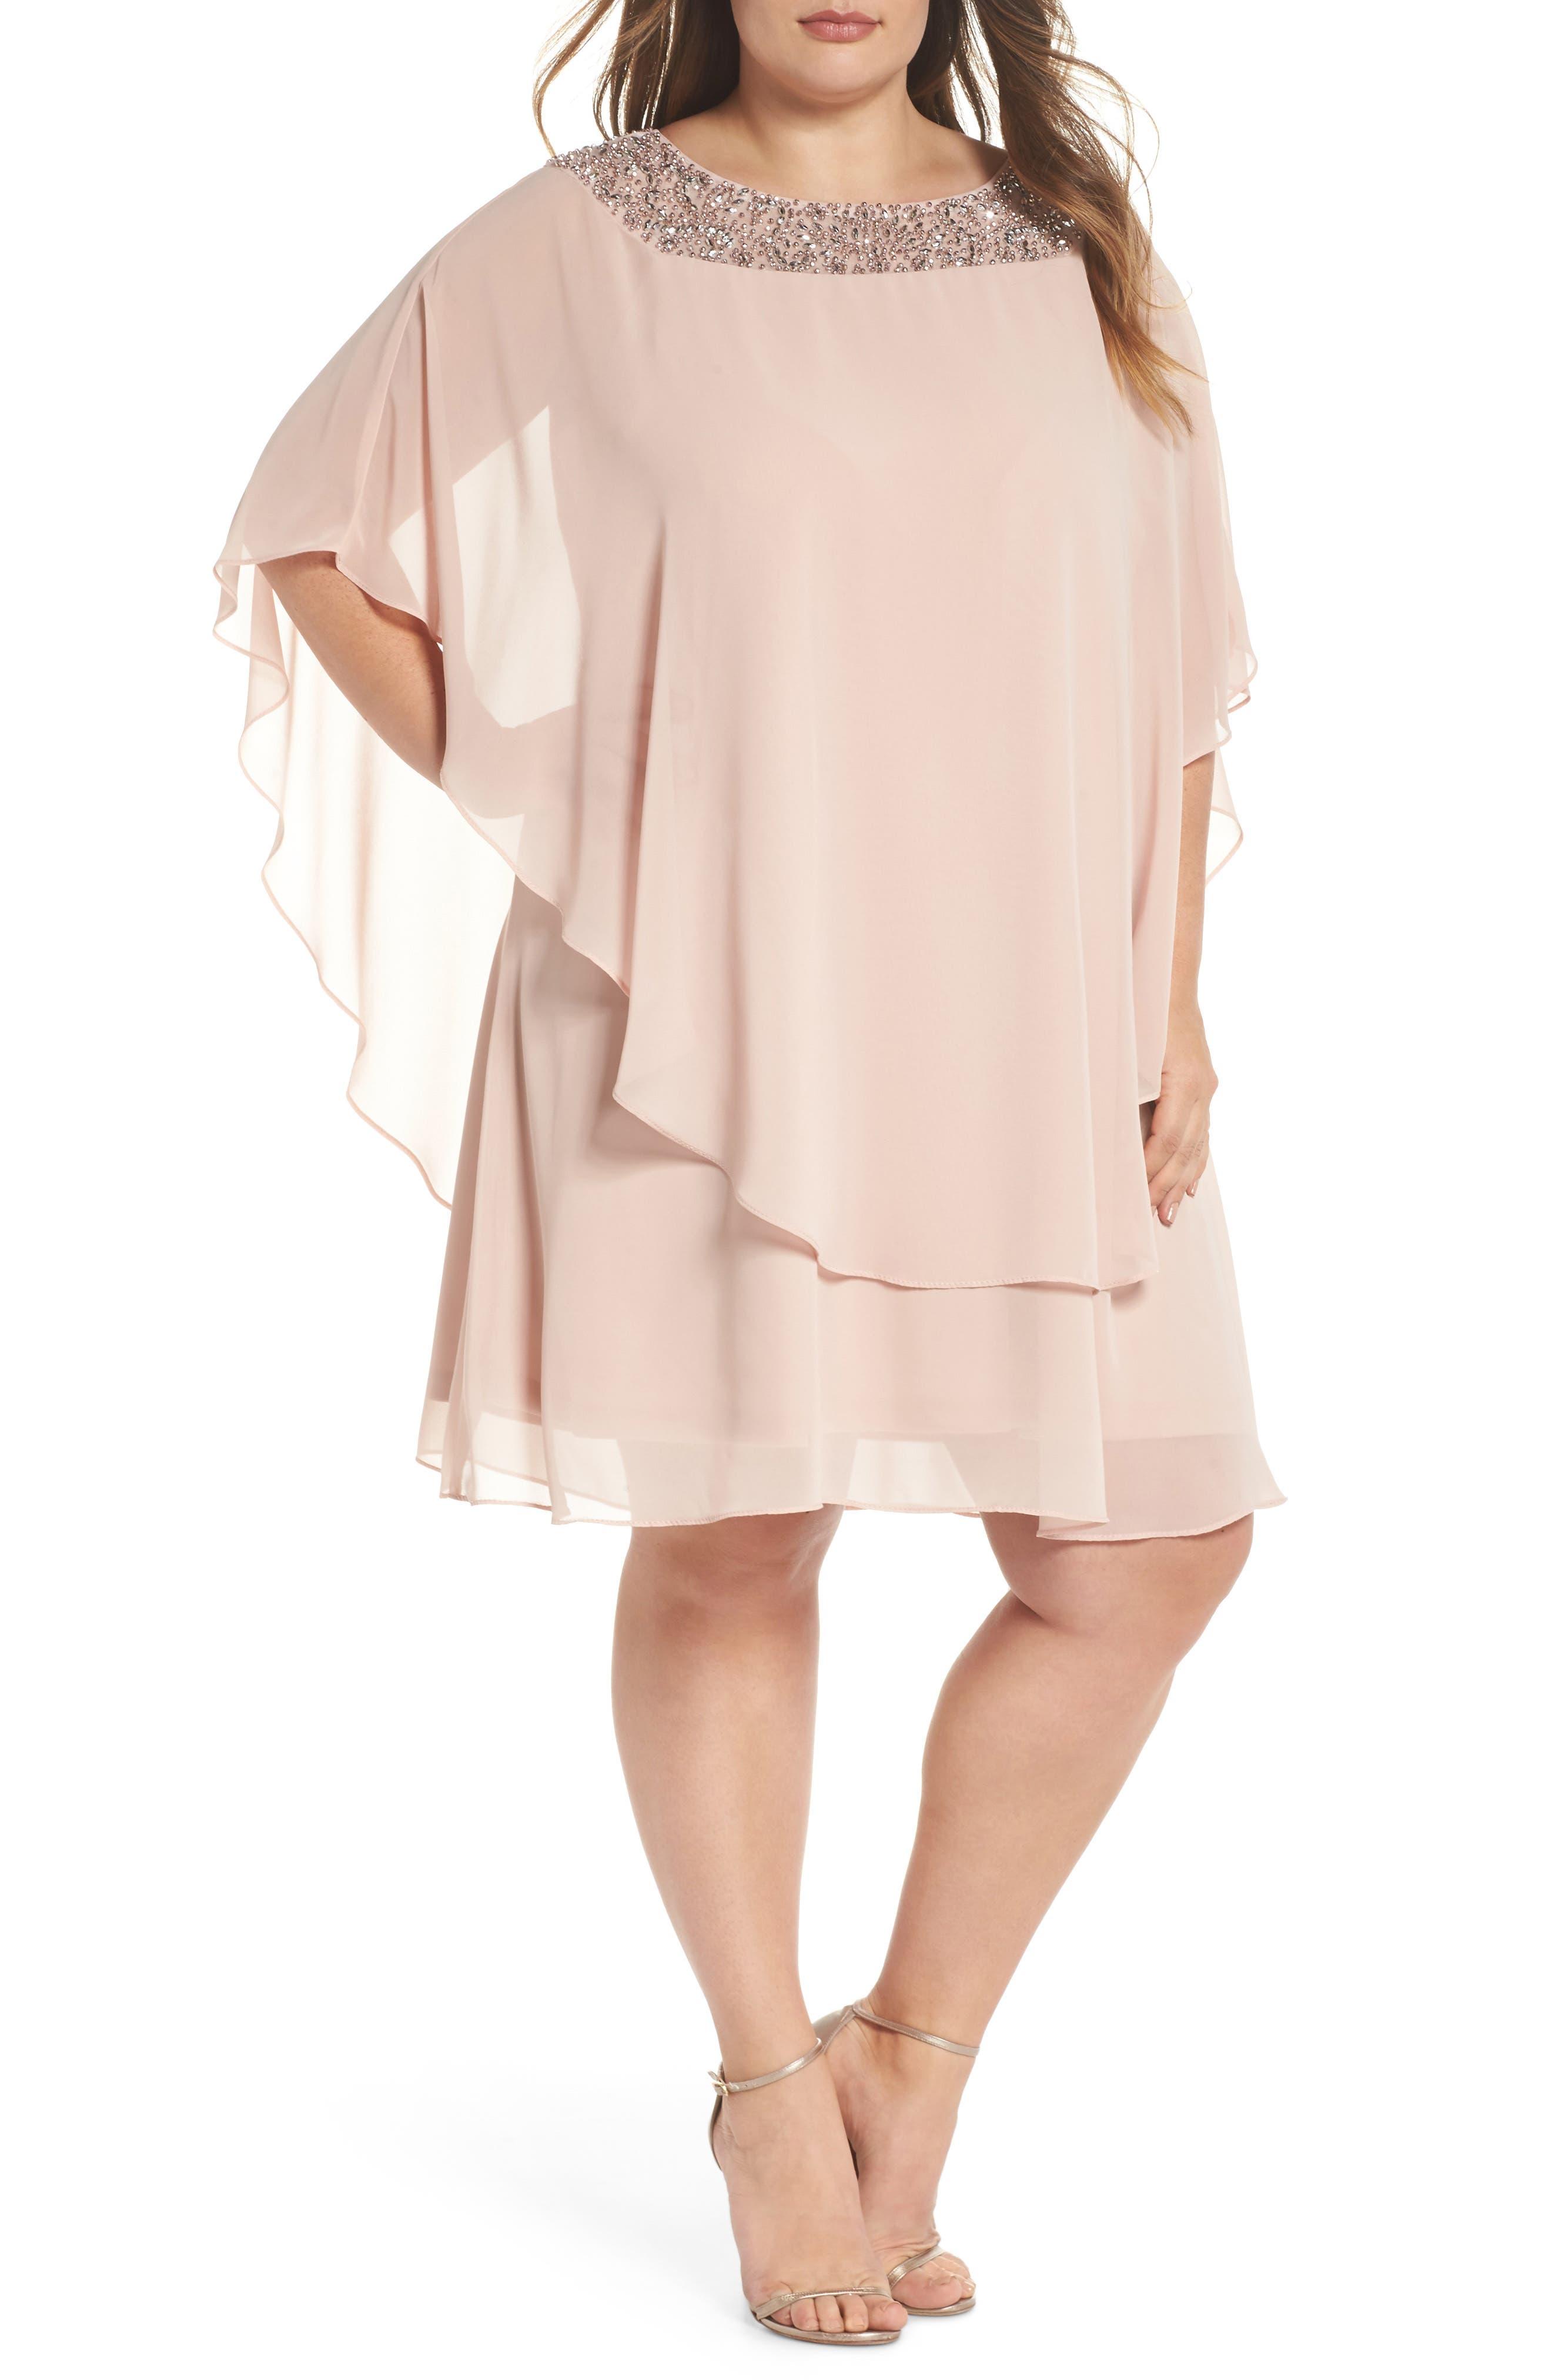 XSCAPE, Beaded Neck Chiffon Overlay Dress, Main thumbnail 1, color, BLUSH/ SILVER